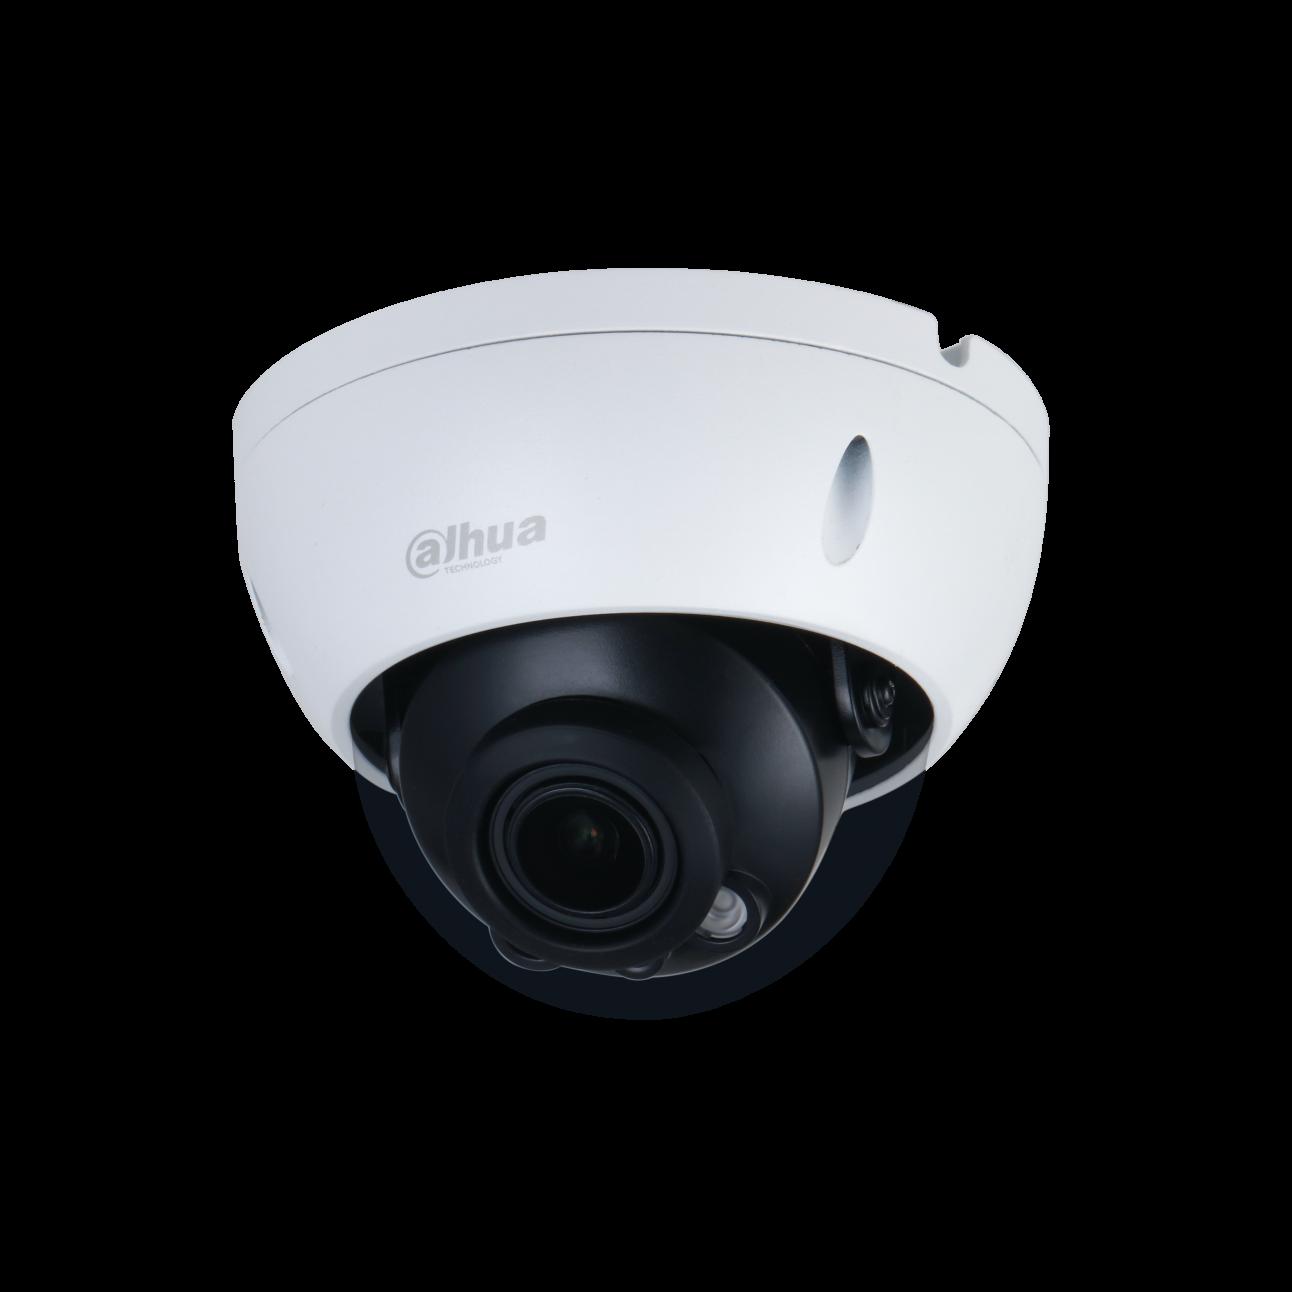 IP камера Dahua DH-IPC-HDBW3441RP-ZS уличная купольная 4Мп, моториз.объектив 2.7-13.5мм, WDR, MicroSD, ИК до 40м, DC12B/PoE, IP67, IK10